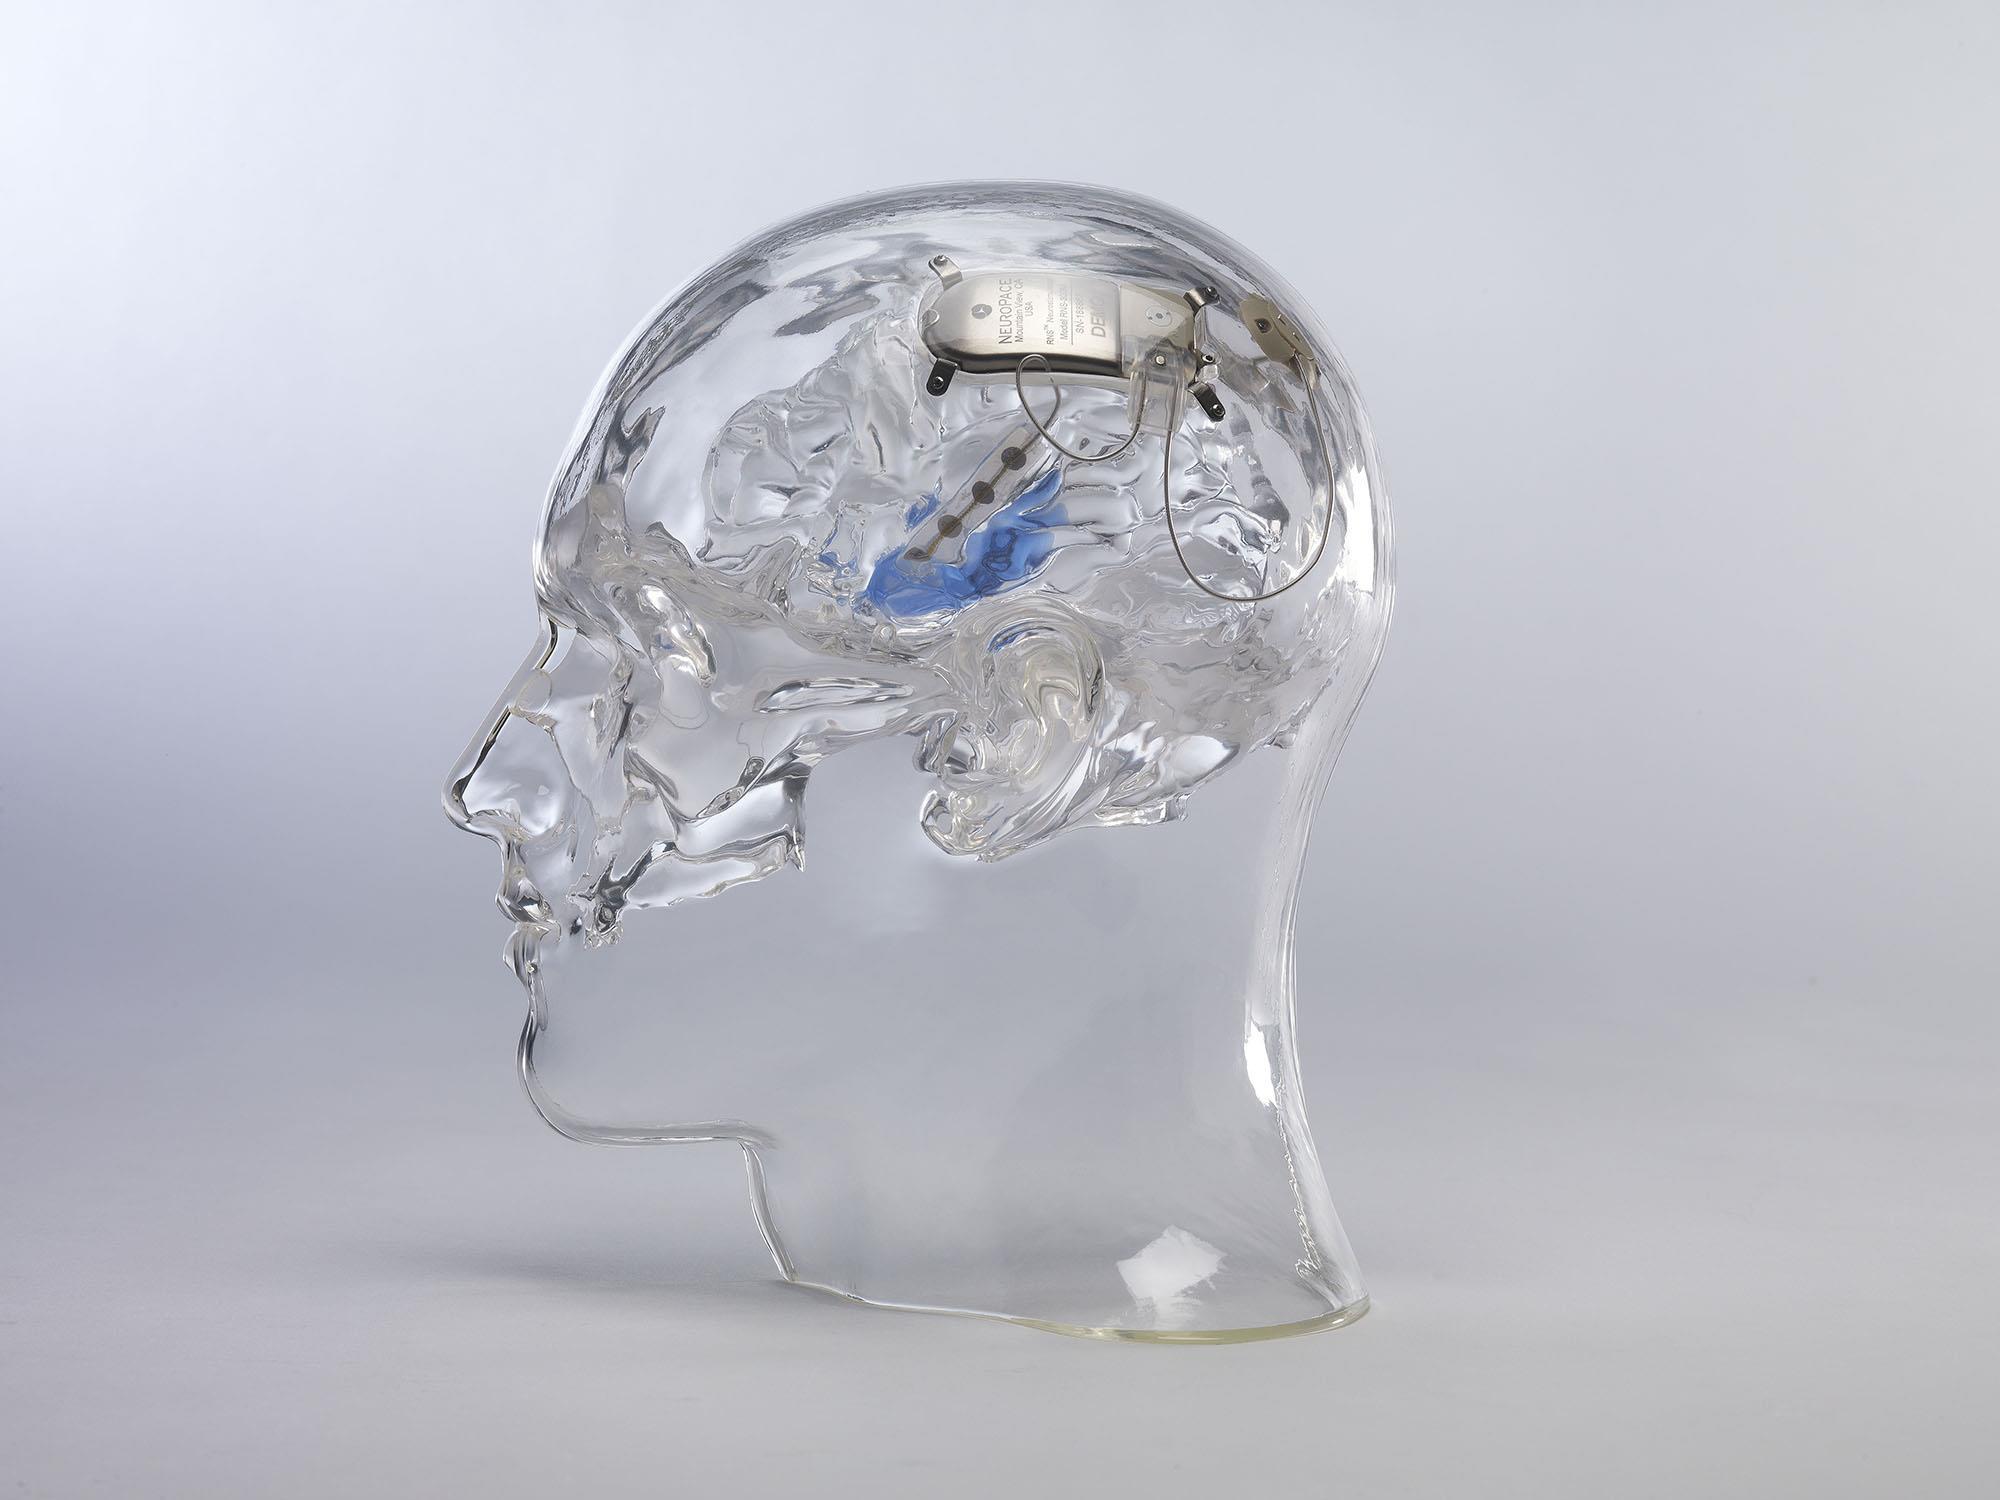 cyborgrx how smart implants could change medicine nbc news